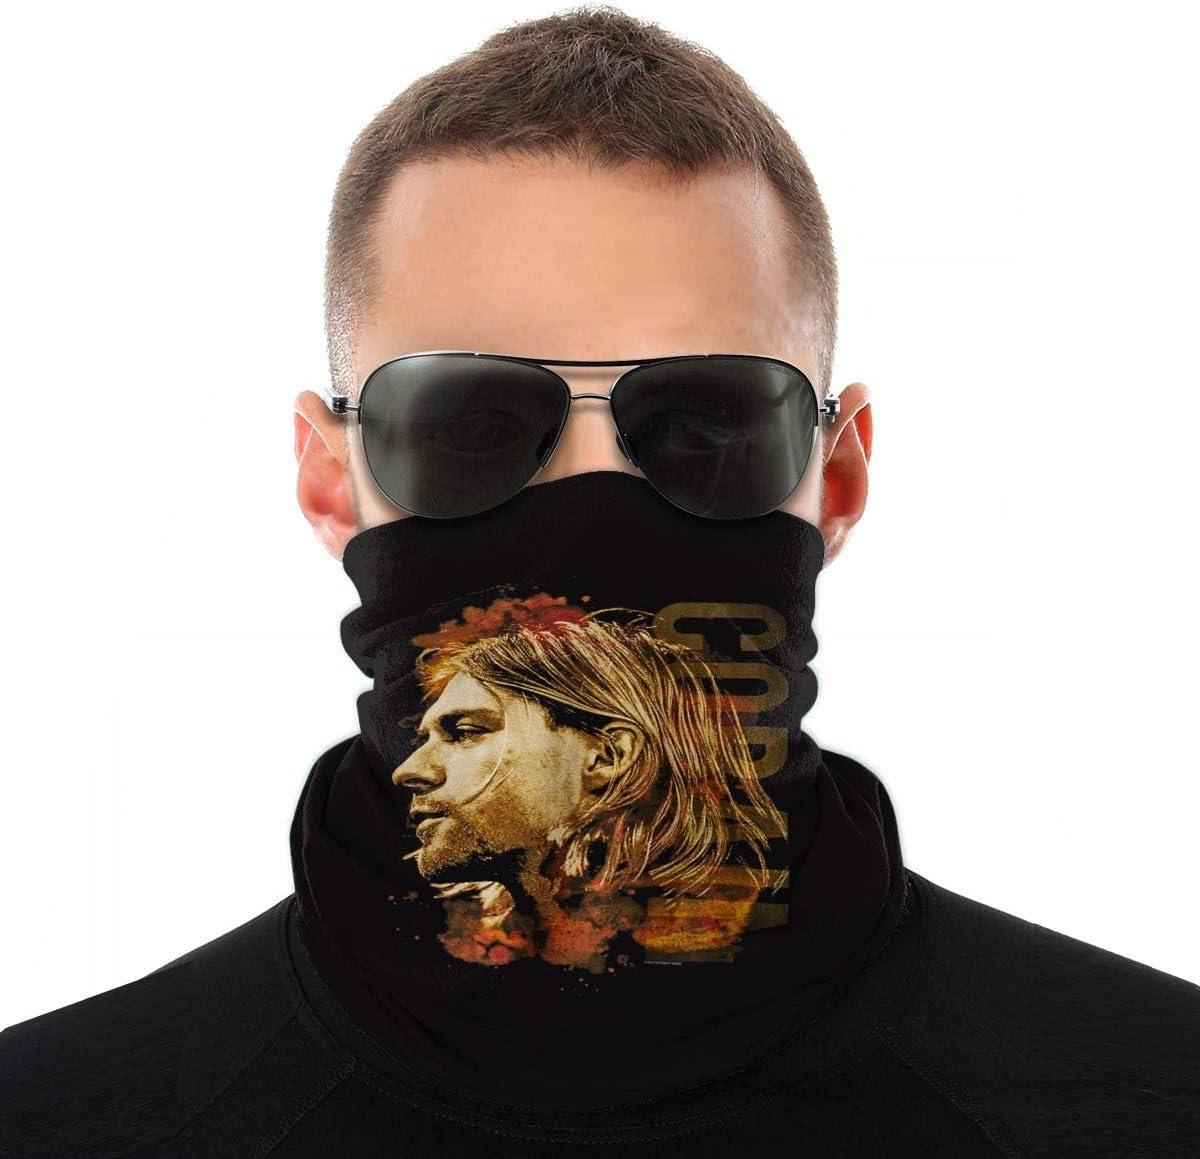 Kurt Cobain Turban Outdoor Seamless Variety Magic Turban Men and Women Turban Neck Windproof Sunscreen Bib